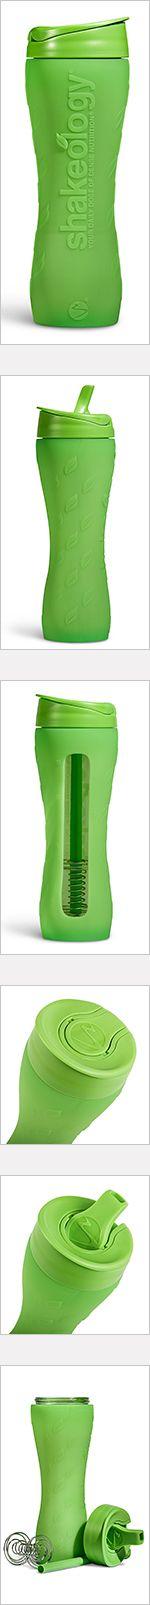 Glass Shakeology Shaker Cup!!!